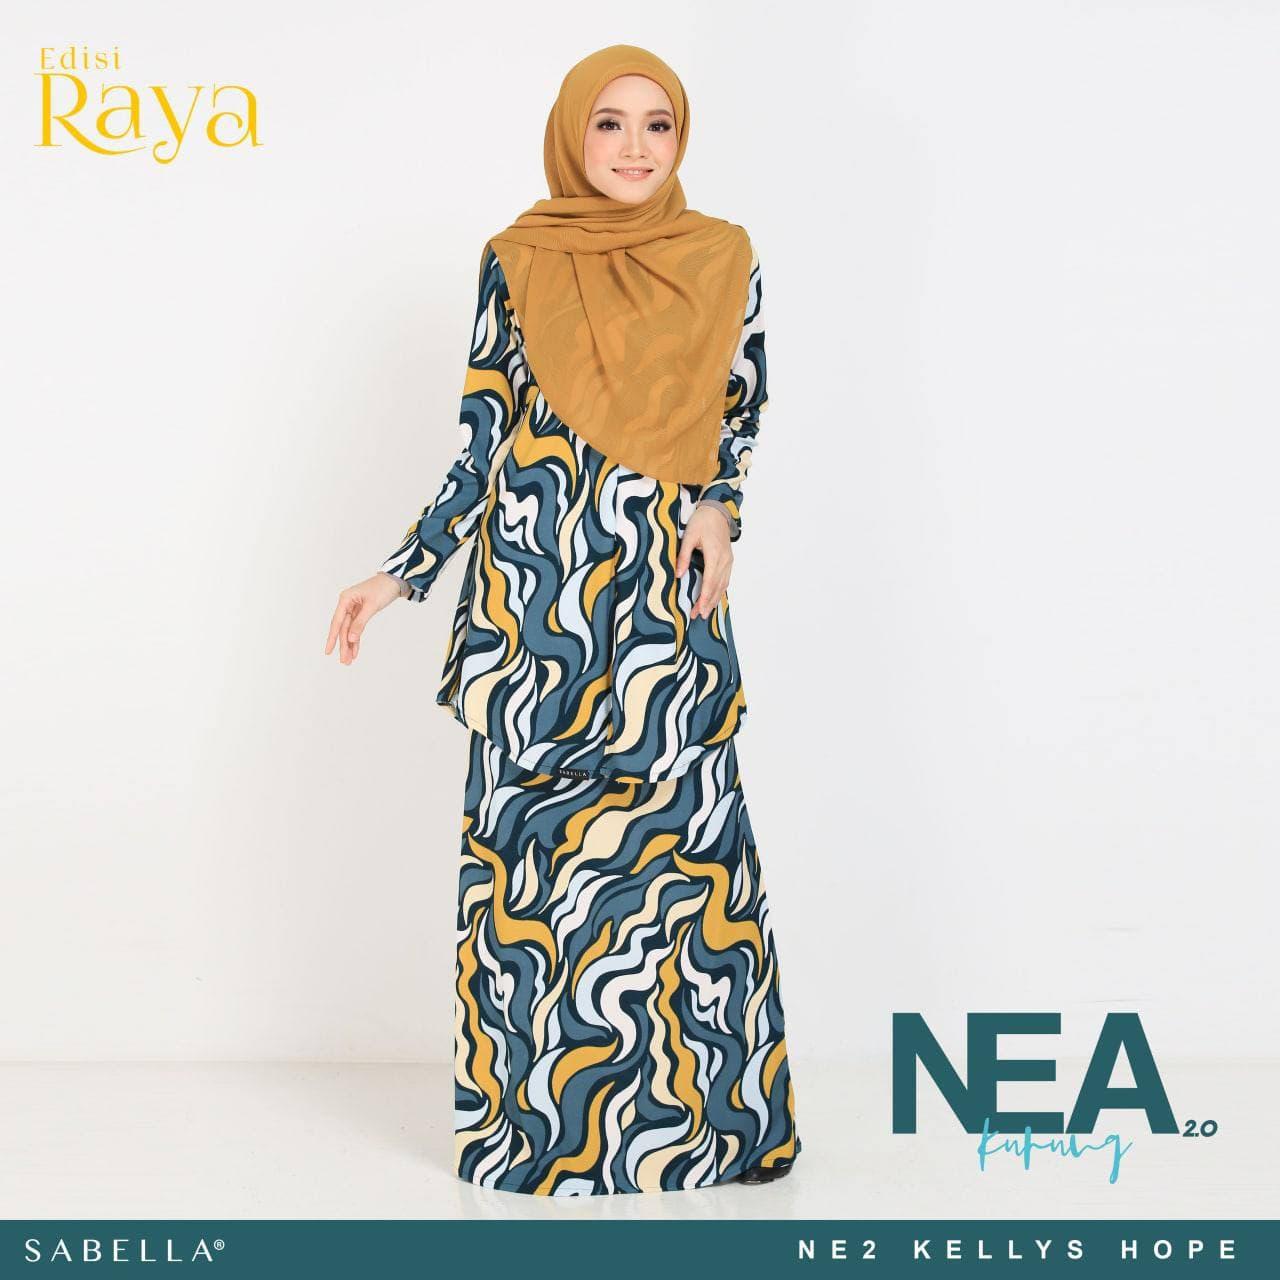 Nea Raya Kellys Hope